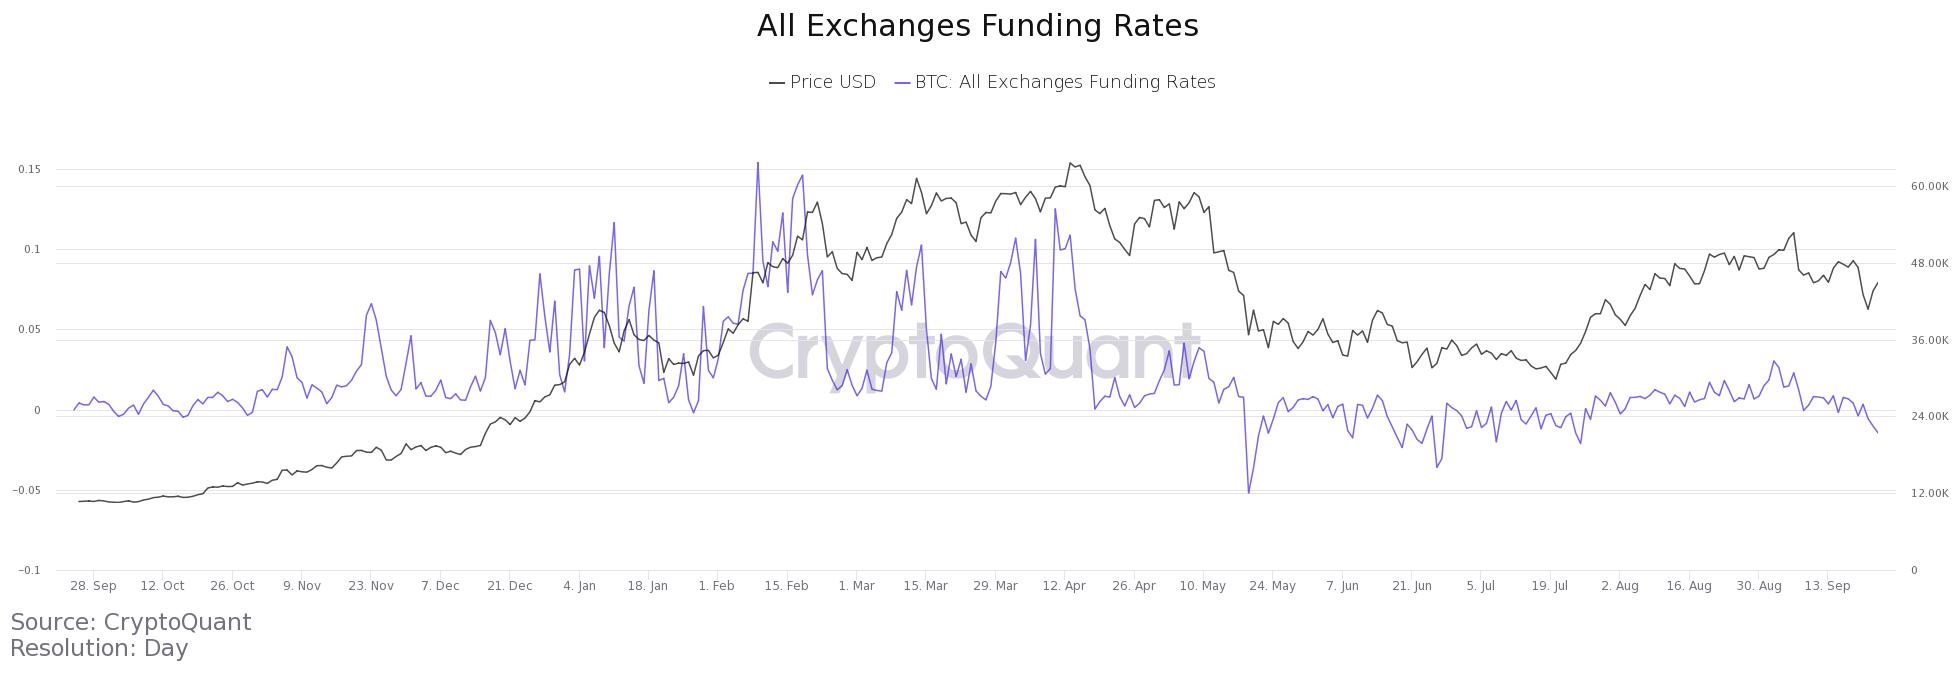 BTC funding rate chart